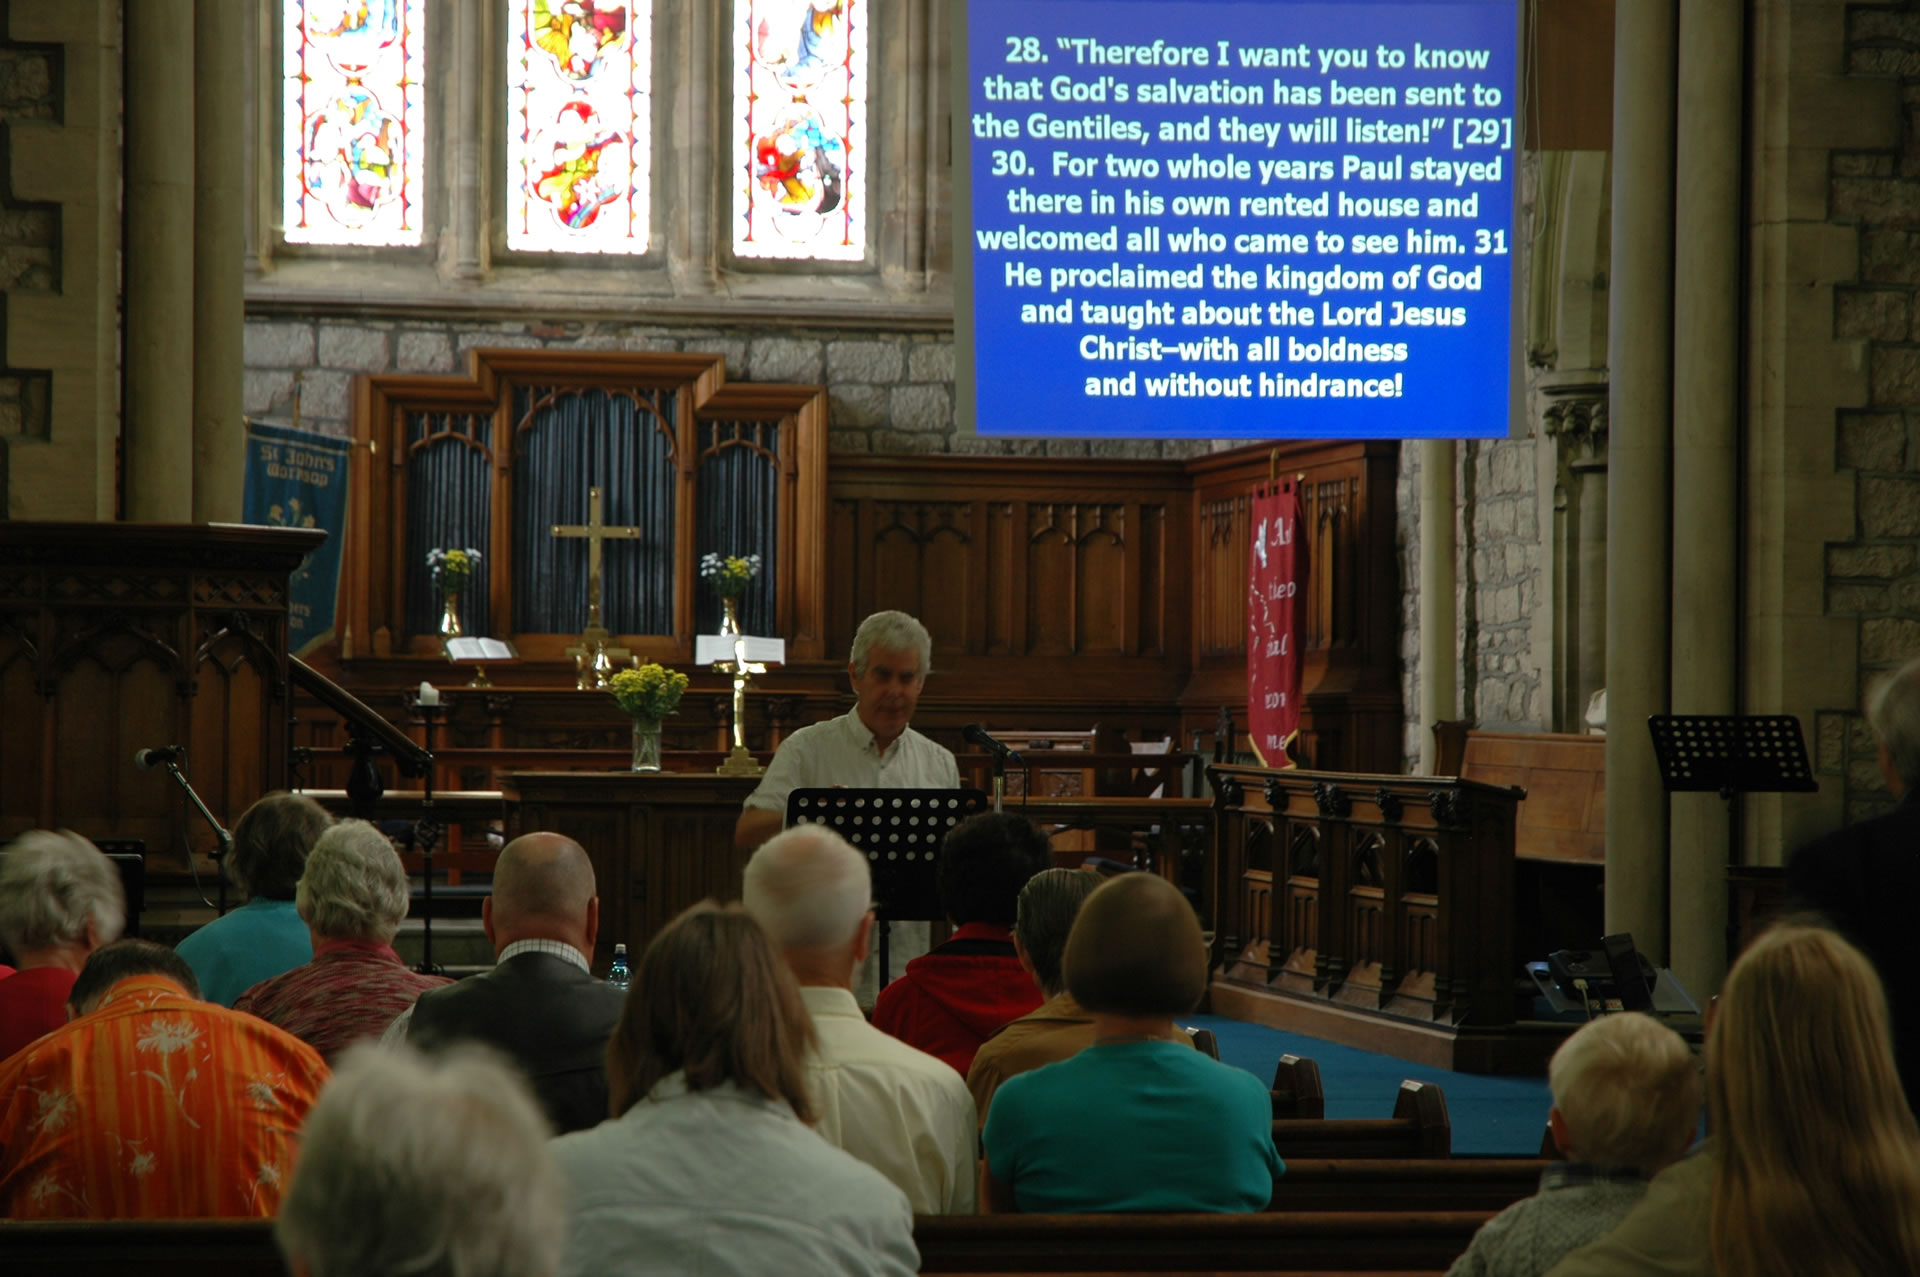 A Sunday Service at St John's